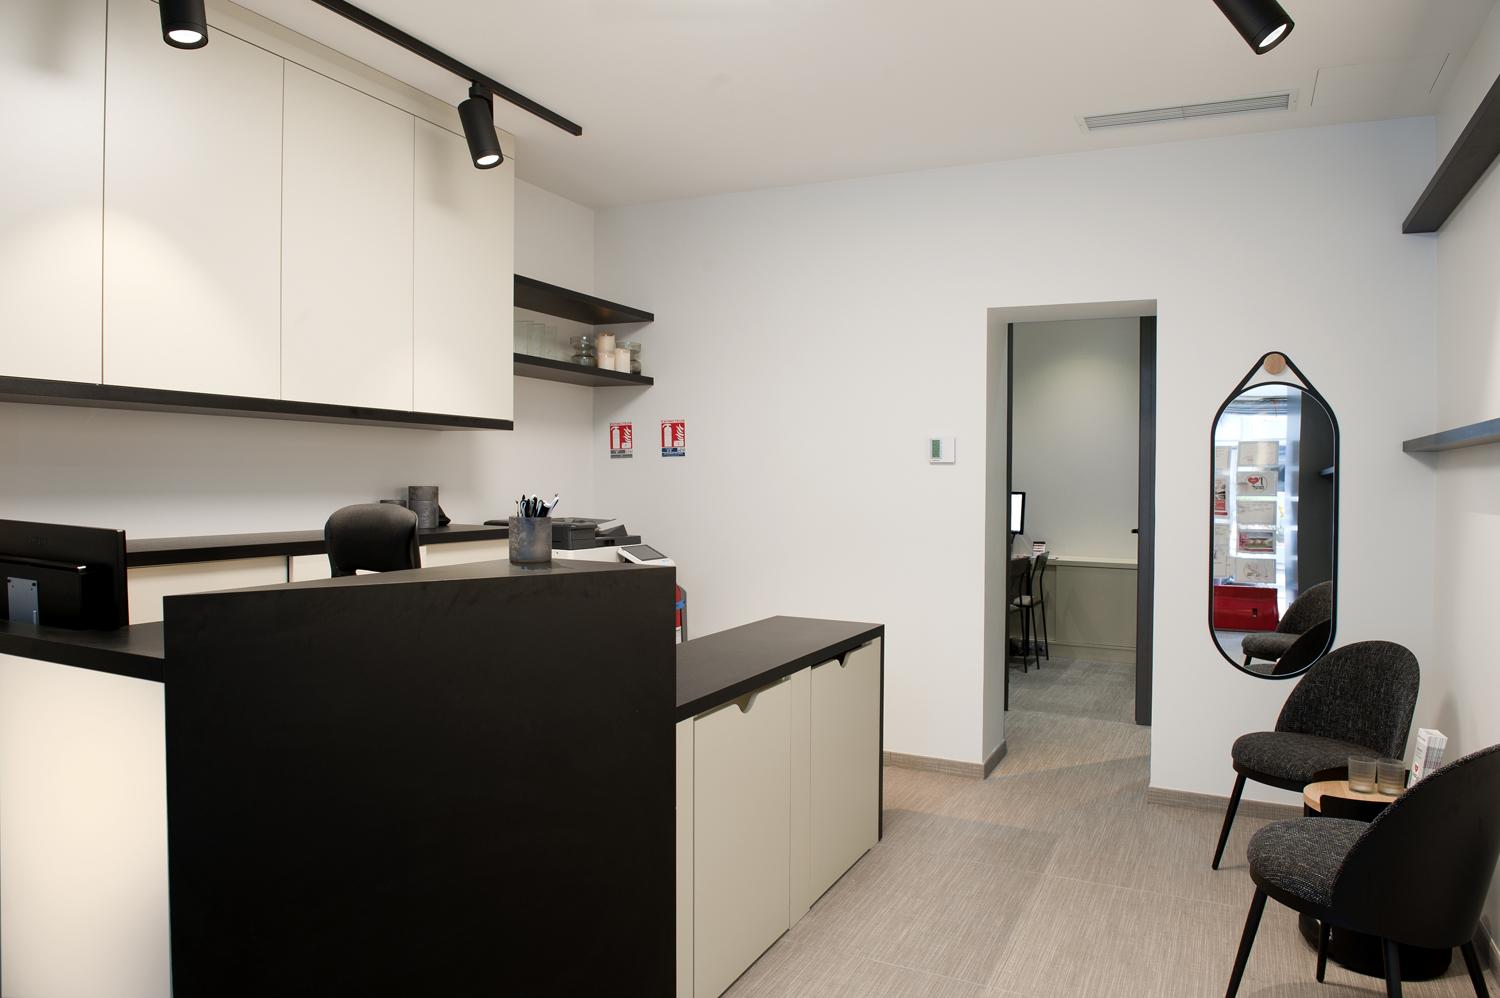 Architecte arlinea architecture for Agence immobiliere 62